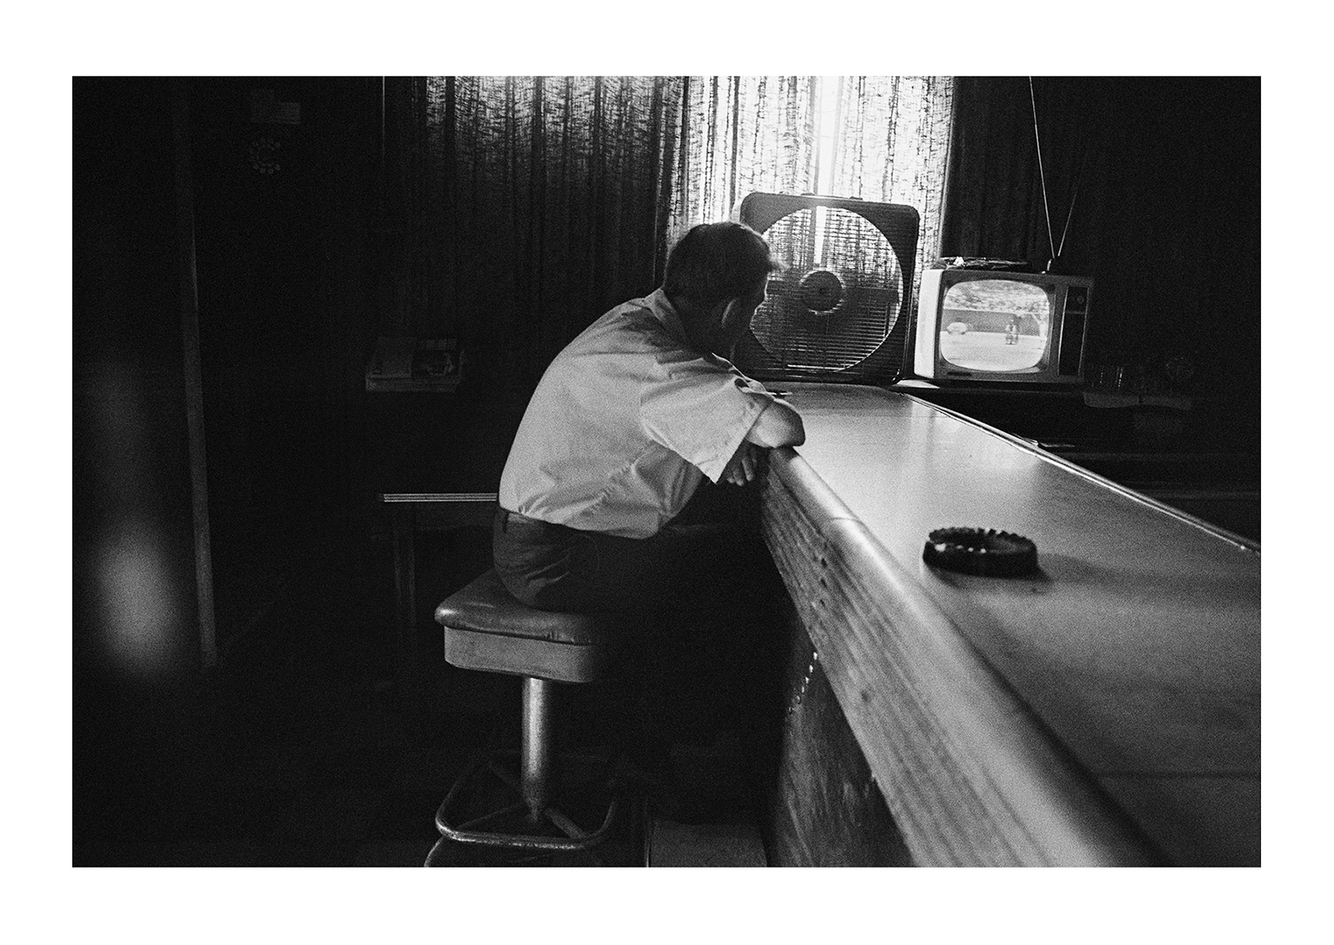 Man Sitting at the Bar Watching a Tiger's Game, Detroit 1972